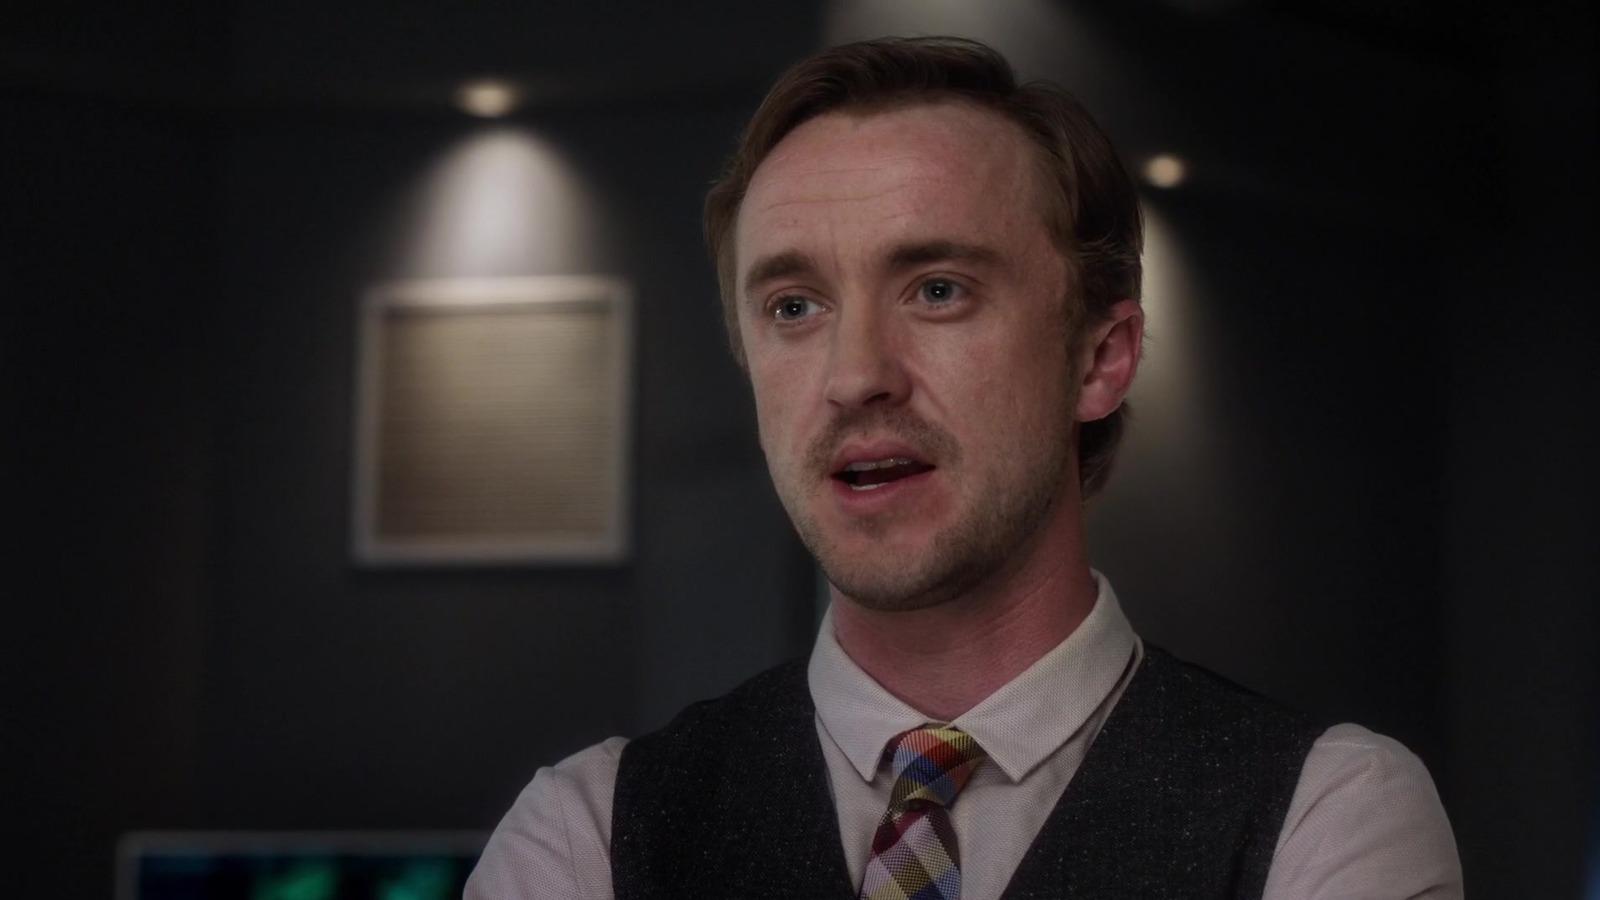 The Real Reason Tom Felton Left The Flash - Looper